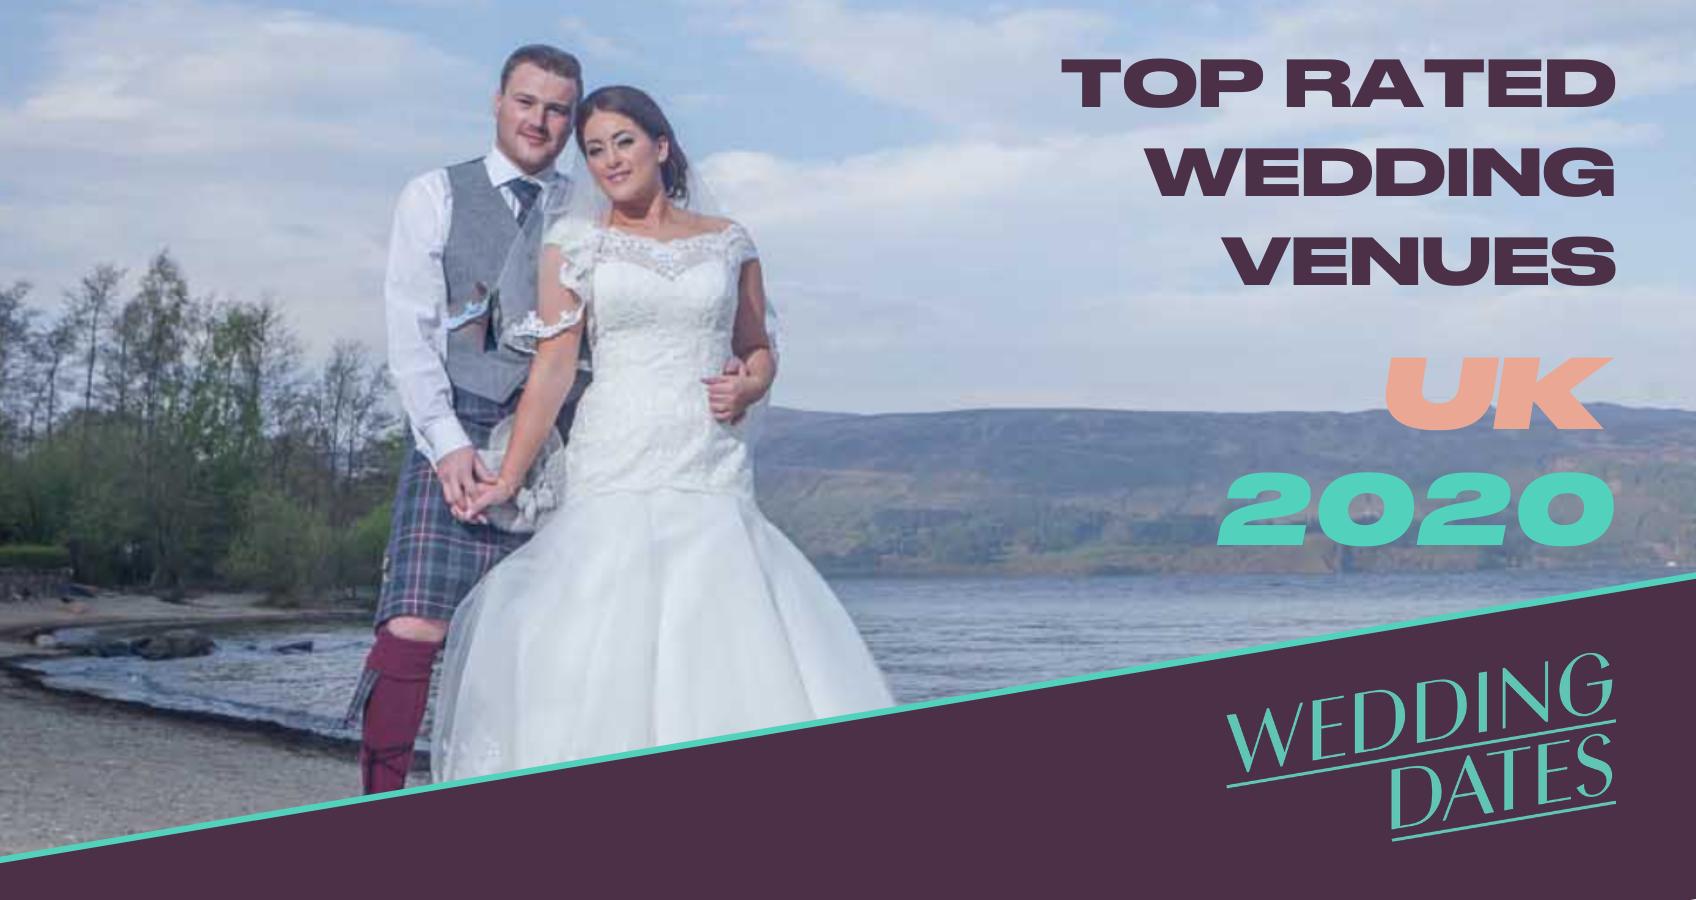 WeddingDates UK Awards Top Rated Wedding Venues